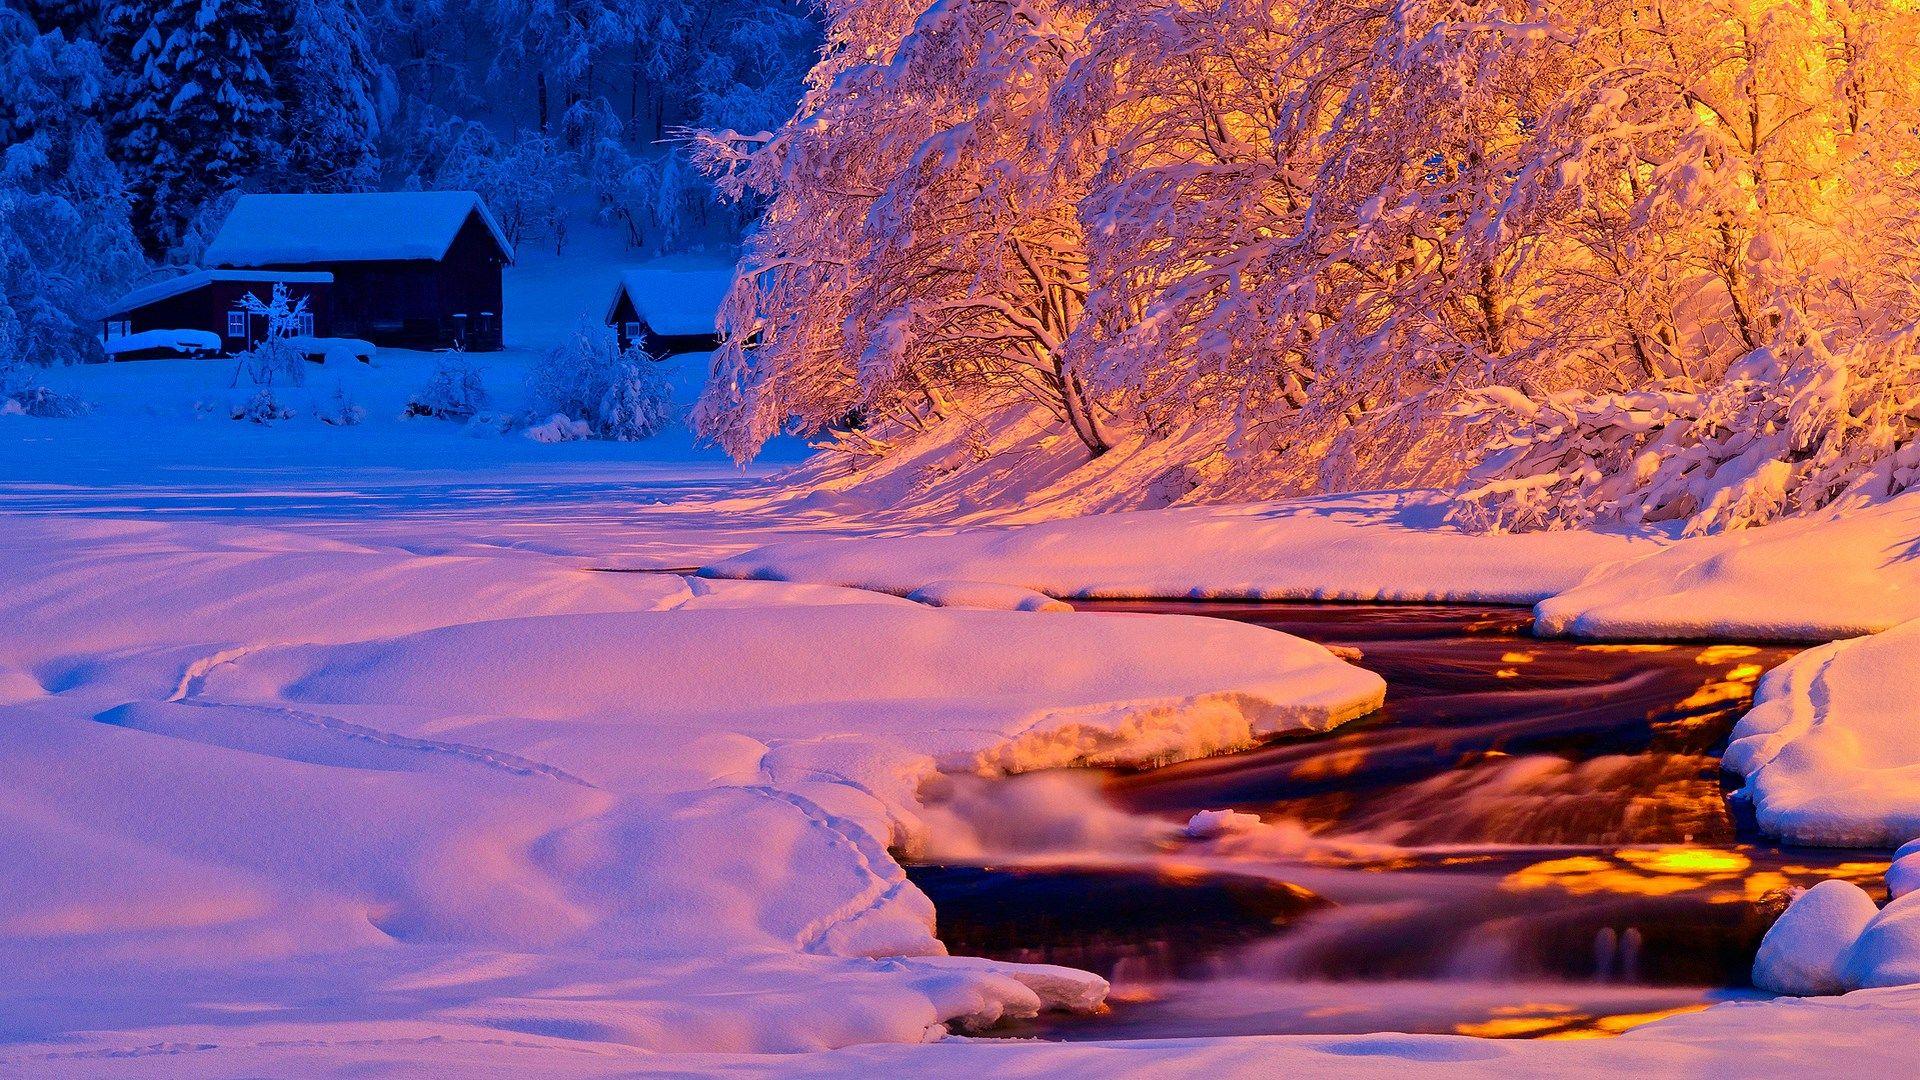 Hd Nature Winter Wallpaper Backgrounds 1920x1080 Winter Landscape Winter Wallpaper Wallpaper Backgrounds